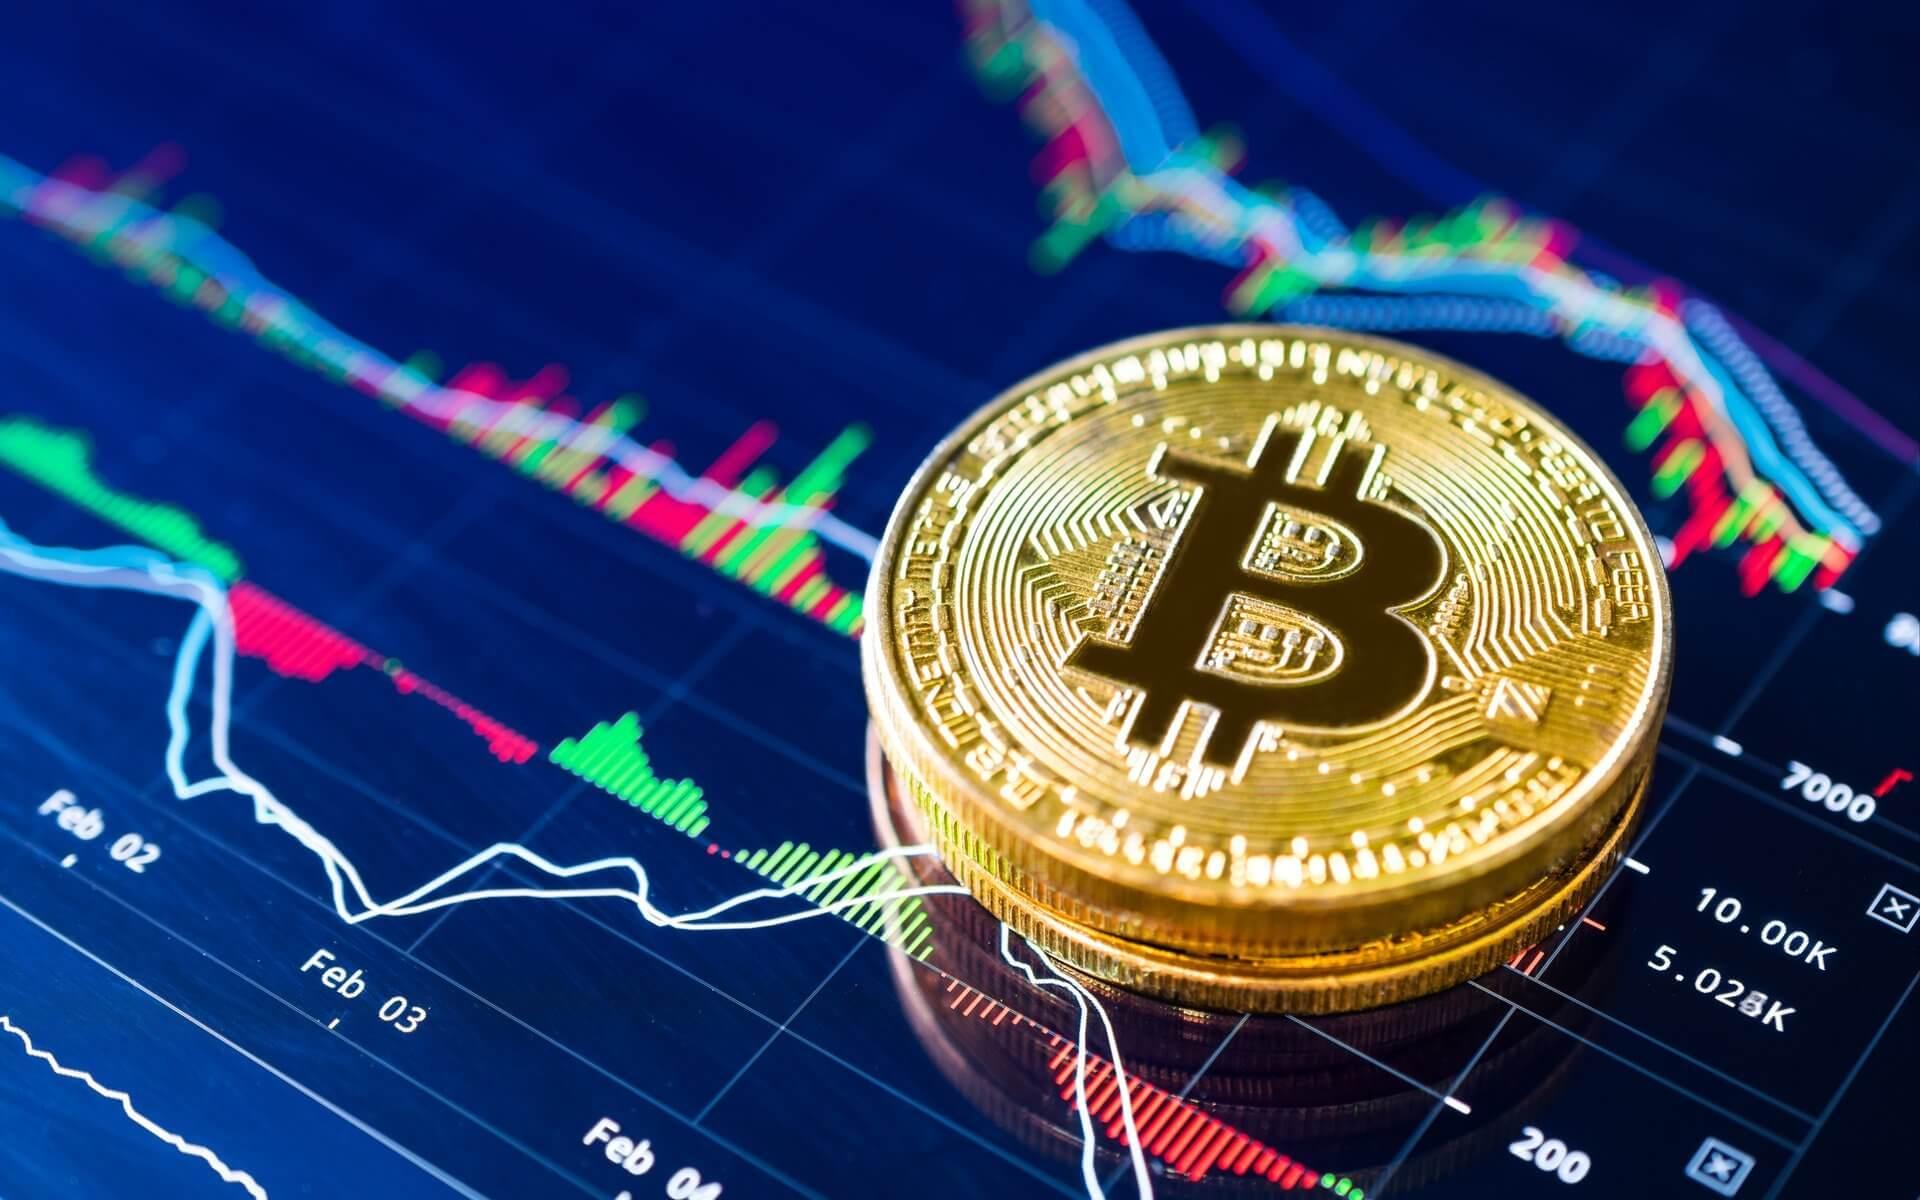 btc bitcoin islem hacmi yuzde 75 yukseldi